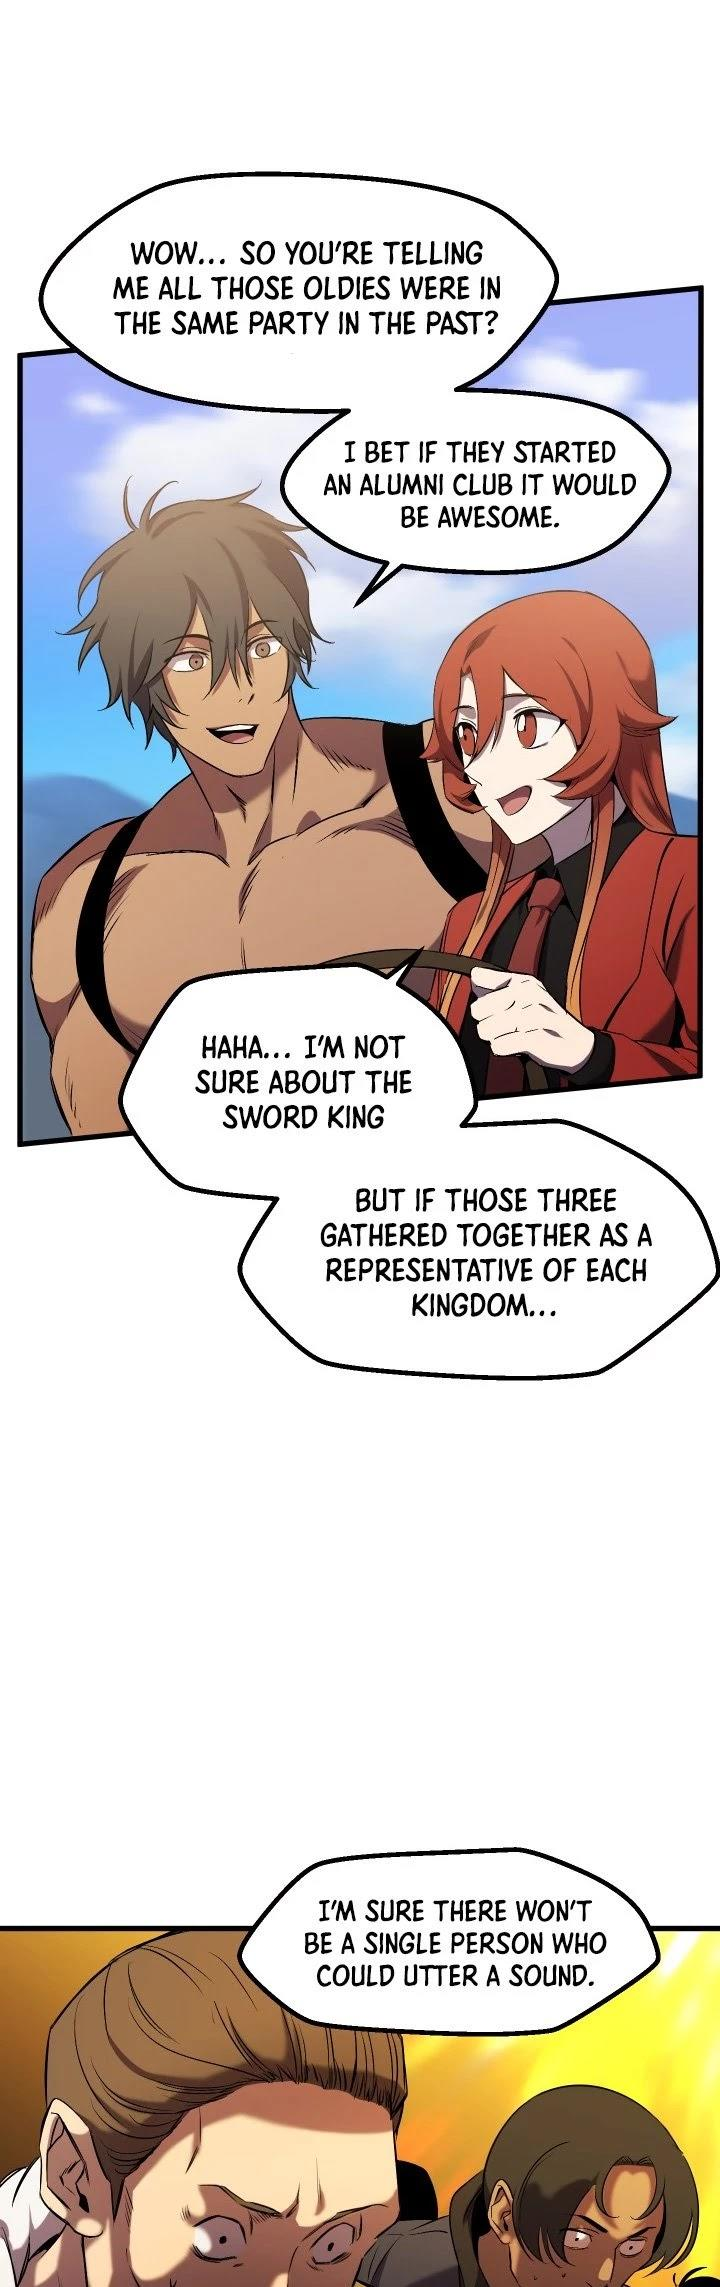 Survival Story Of A Sword King In A Fantasy World Chapter 49 page 40 - Mangakakalots.com